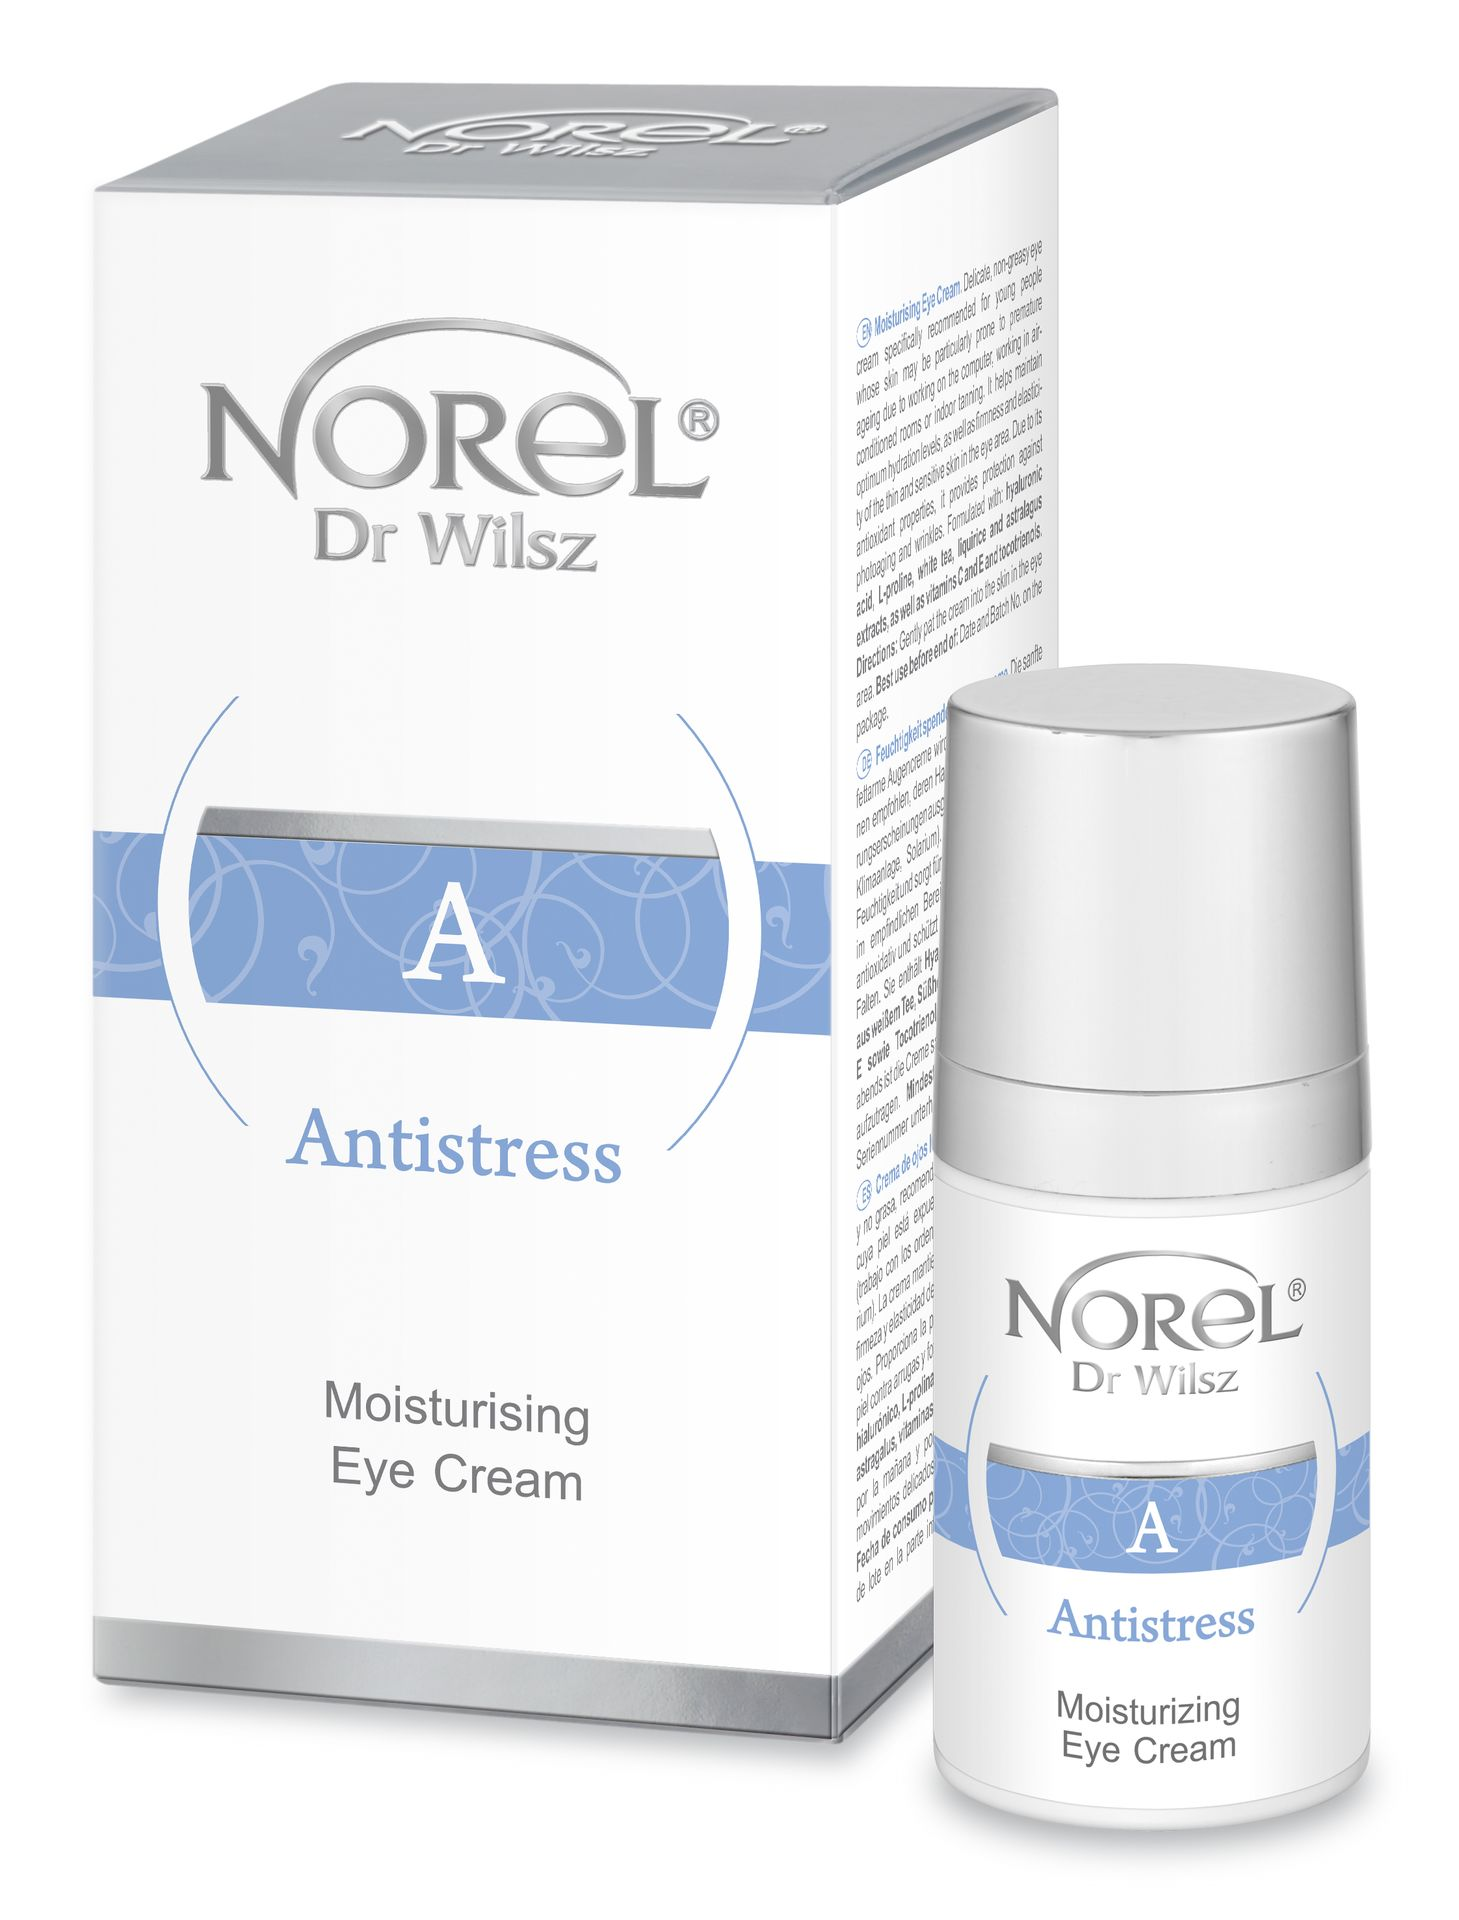 NOREL Dr. Wilsz Эмульсия увлажняющая для кожи вокруг глаз / Soothing and moisturizing eye emulsion 15 мл - Эмульсии